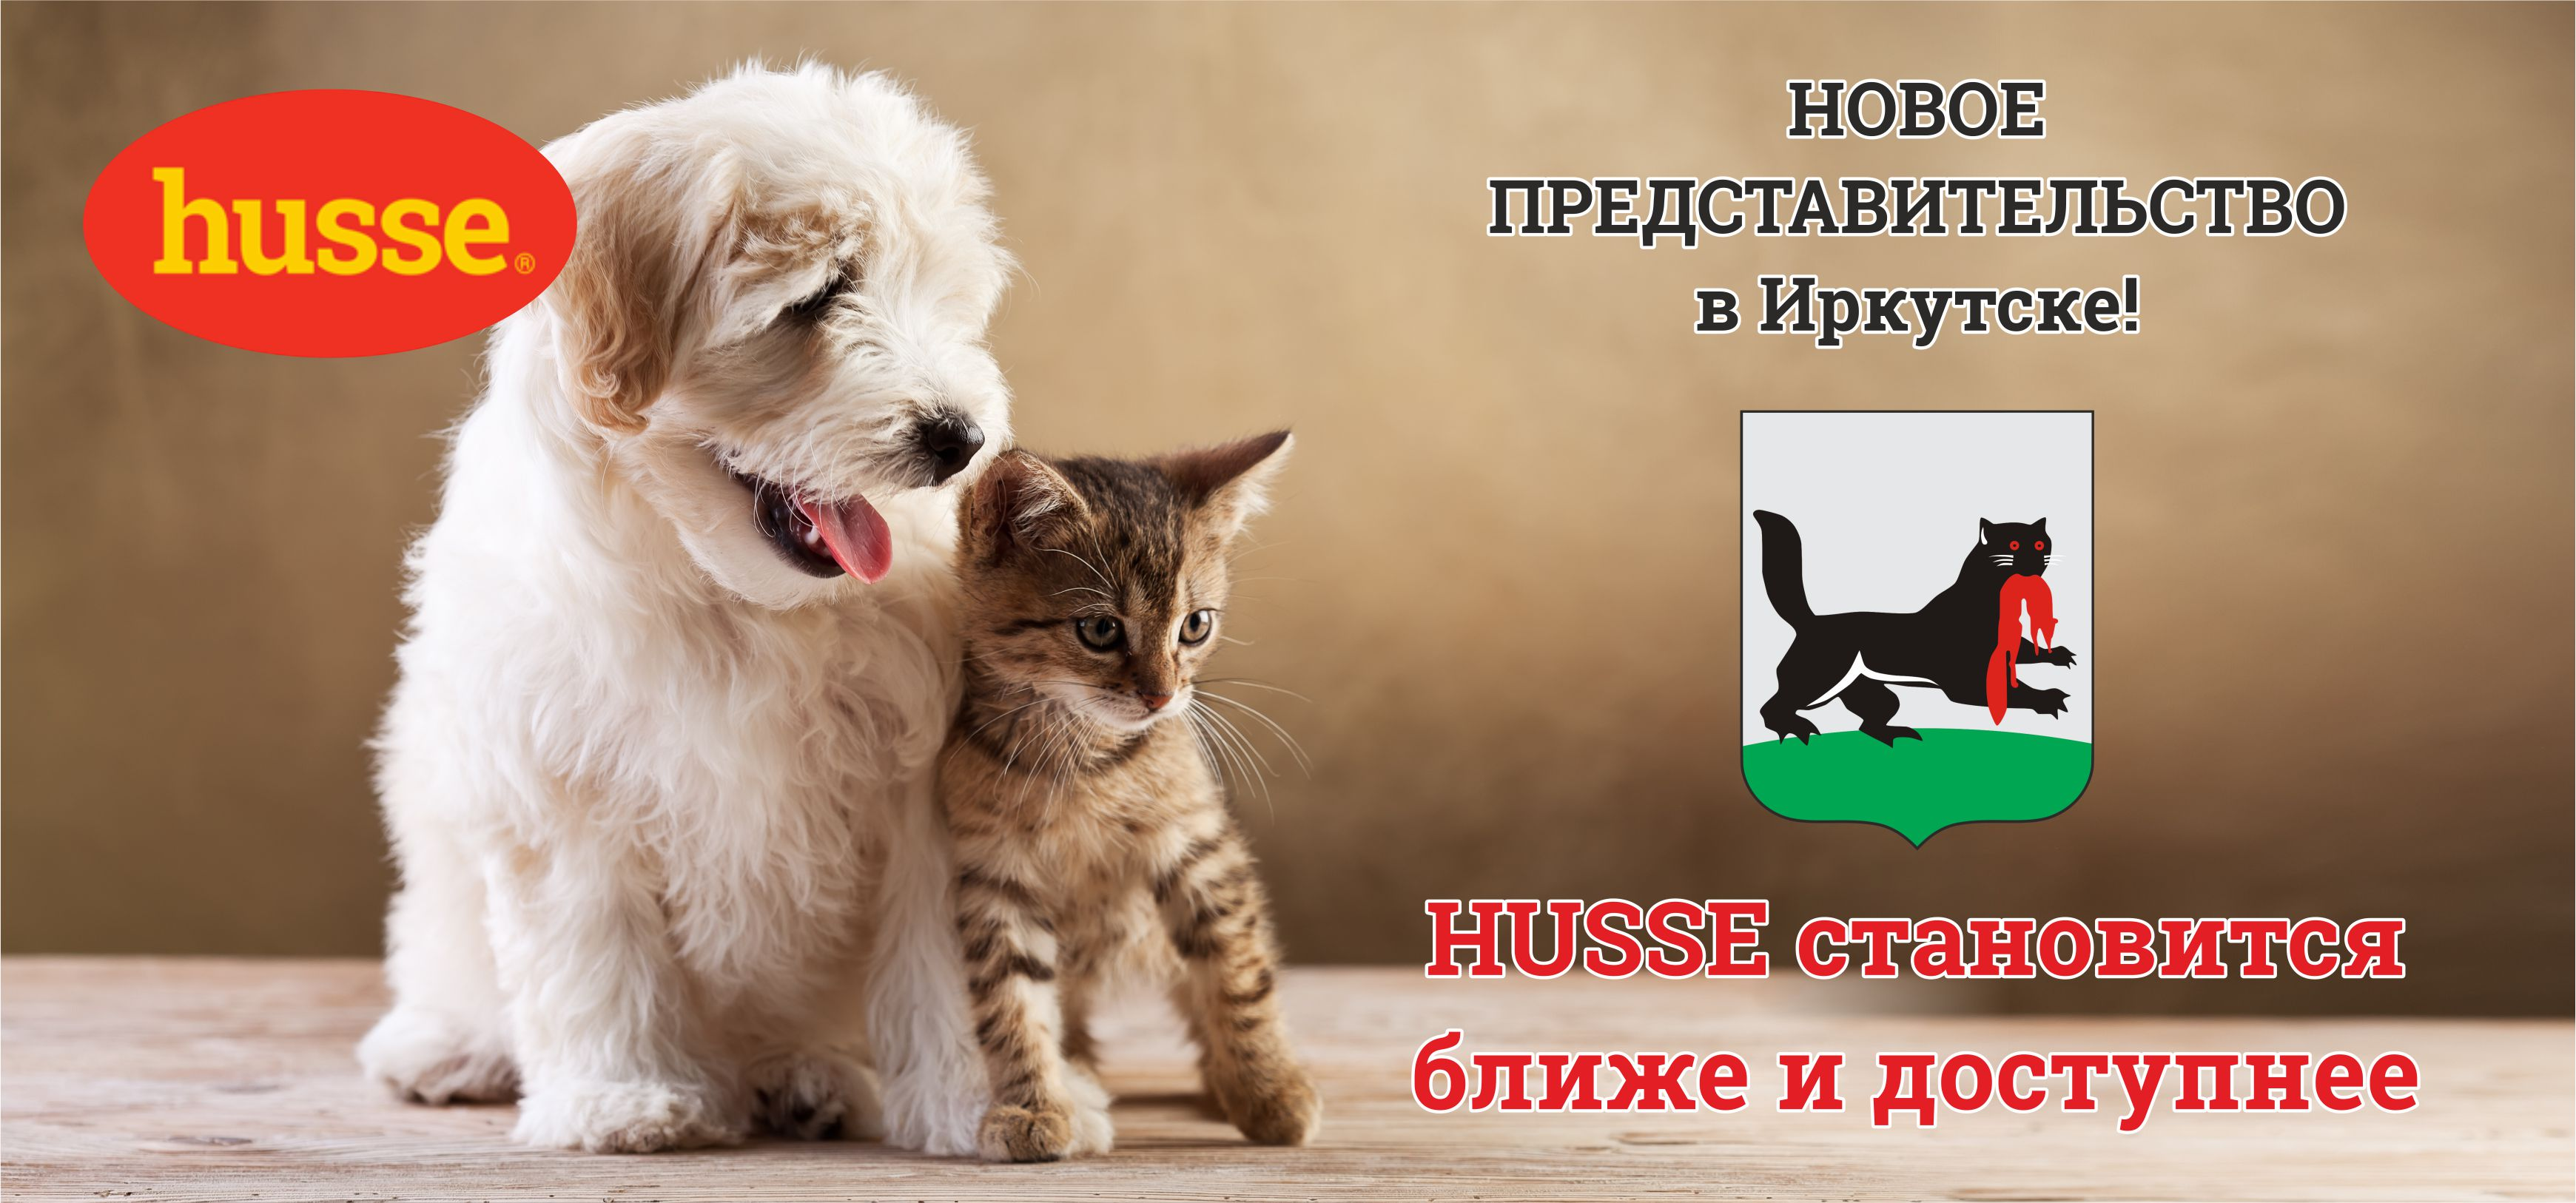 Представительство HUSSE в Иркутске